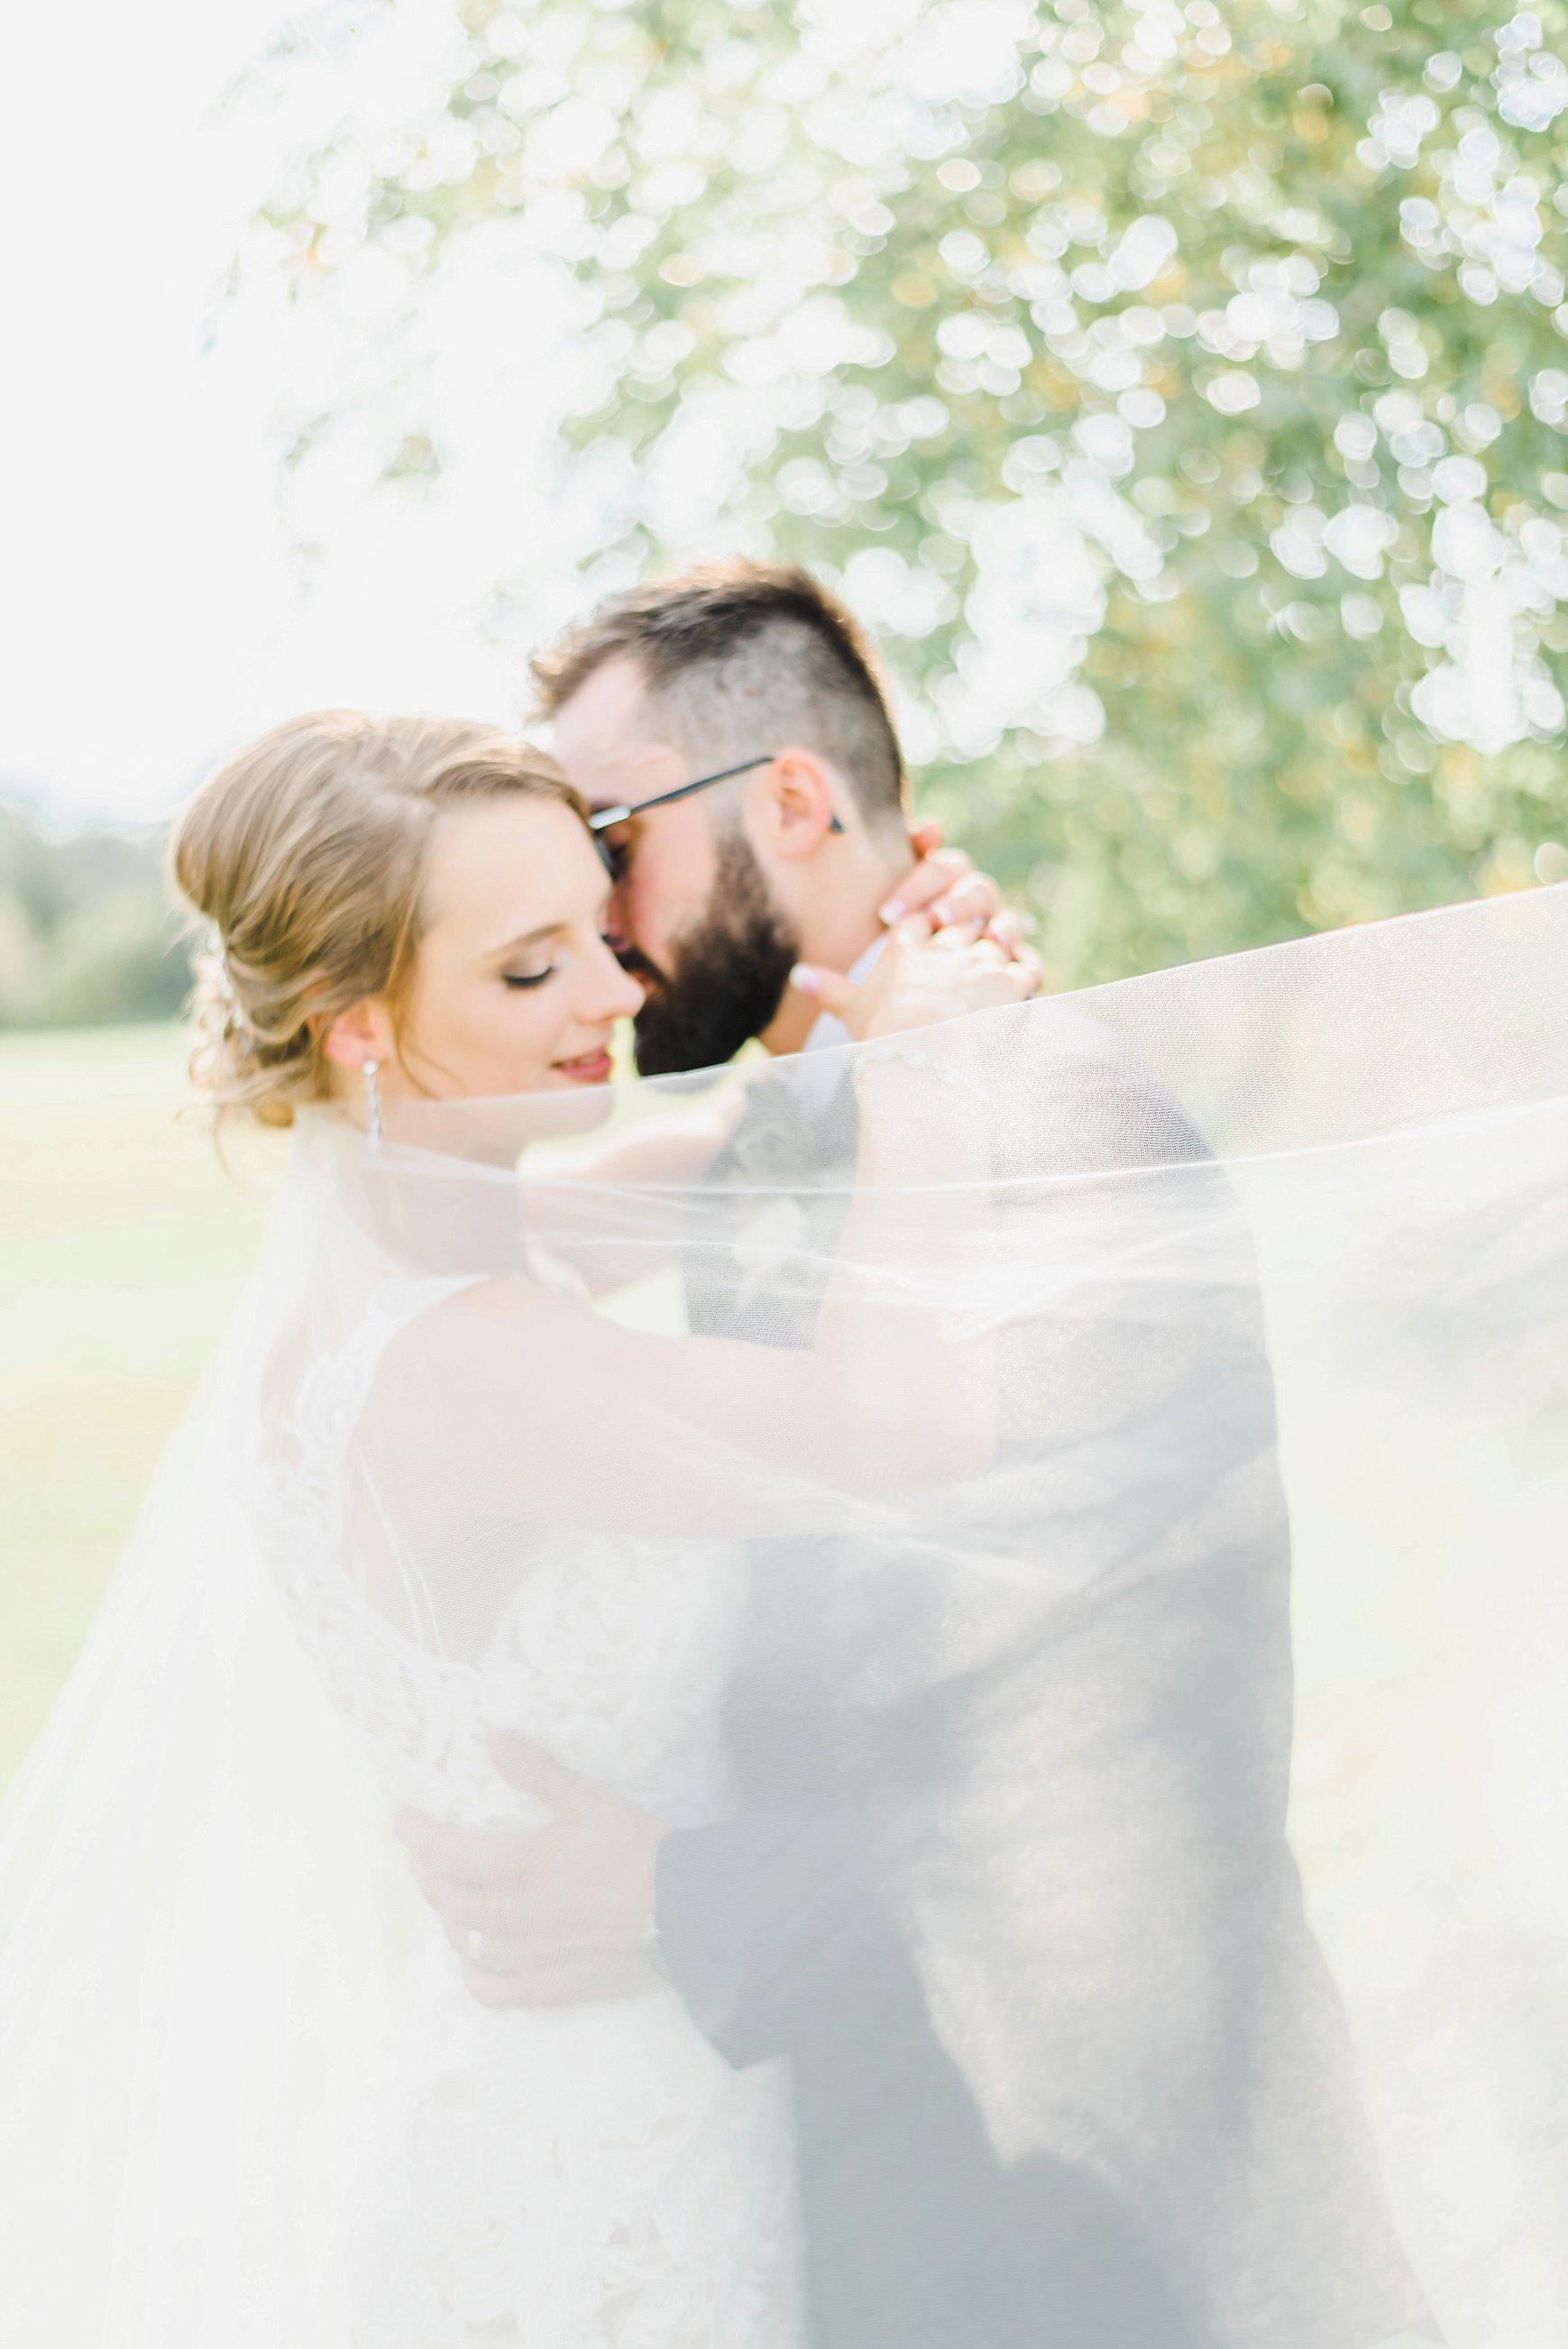 light airy indie fine art ottawa wedding photographer | Ali and Batoul Photography_1318.jpg